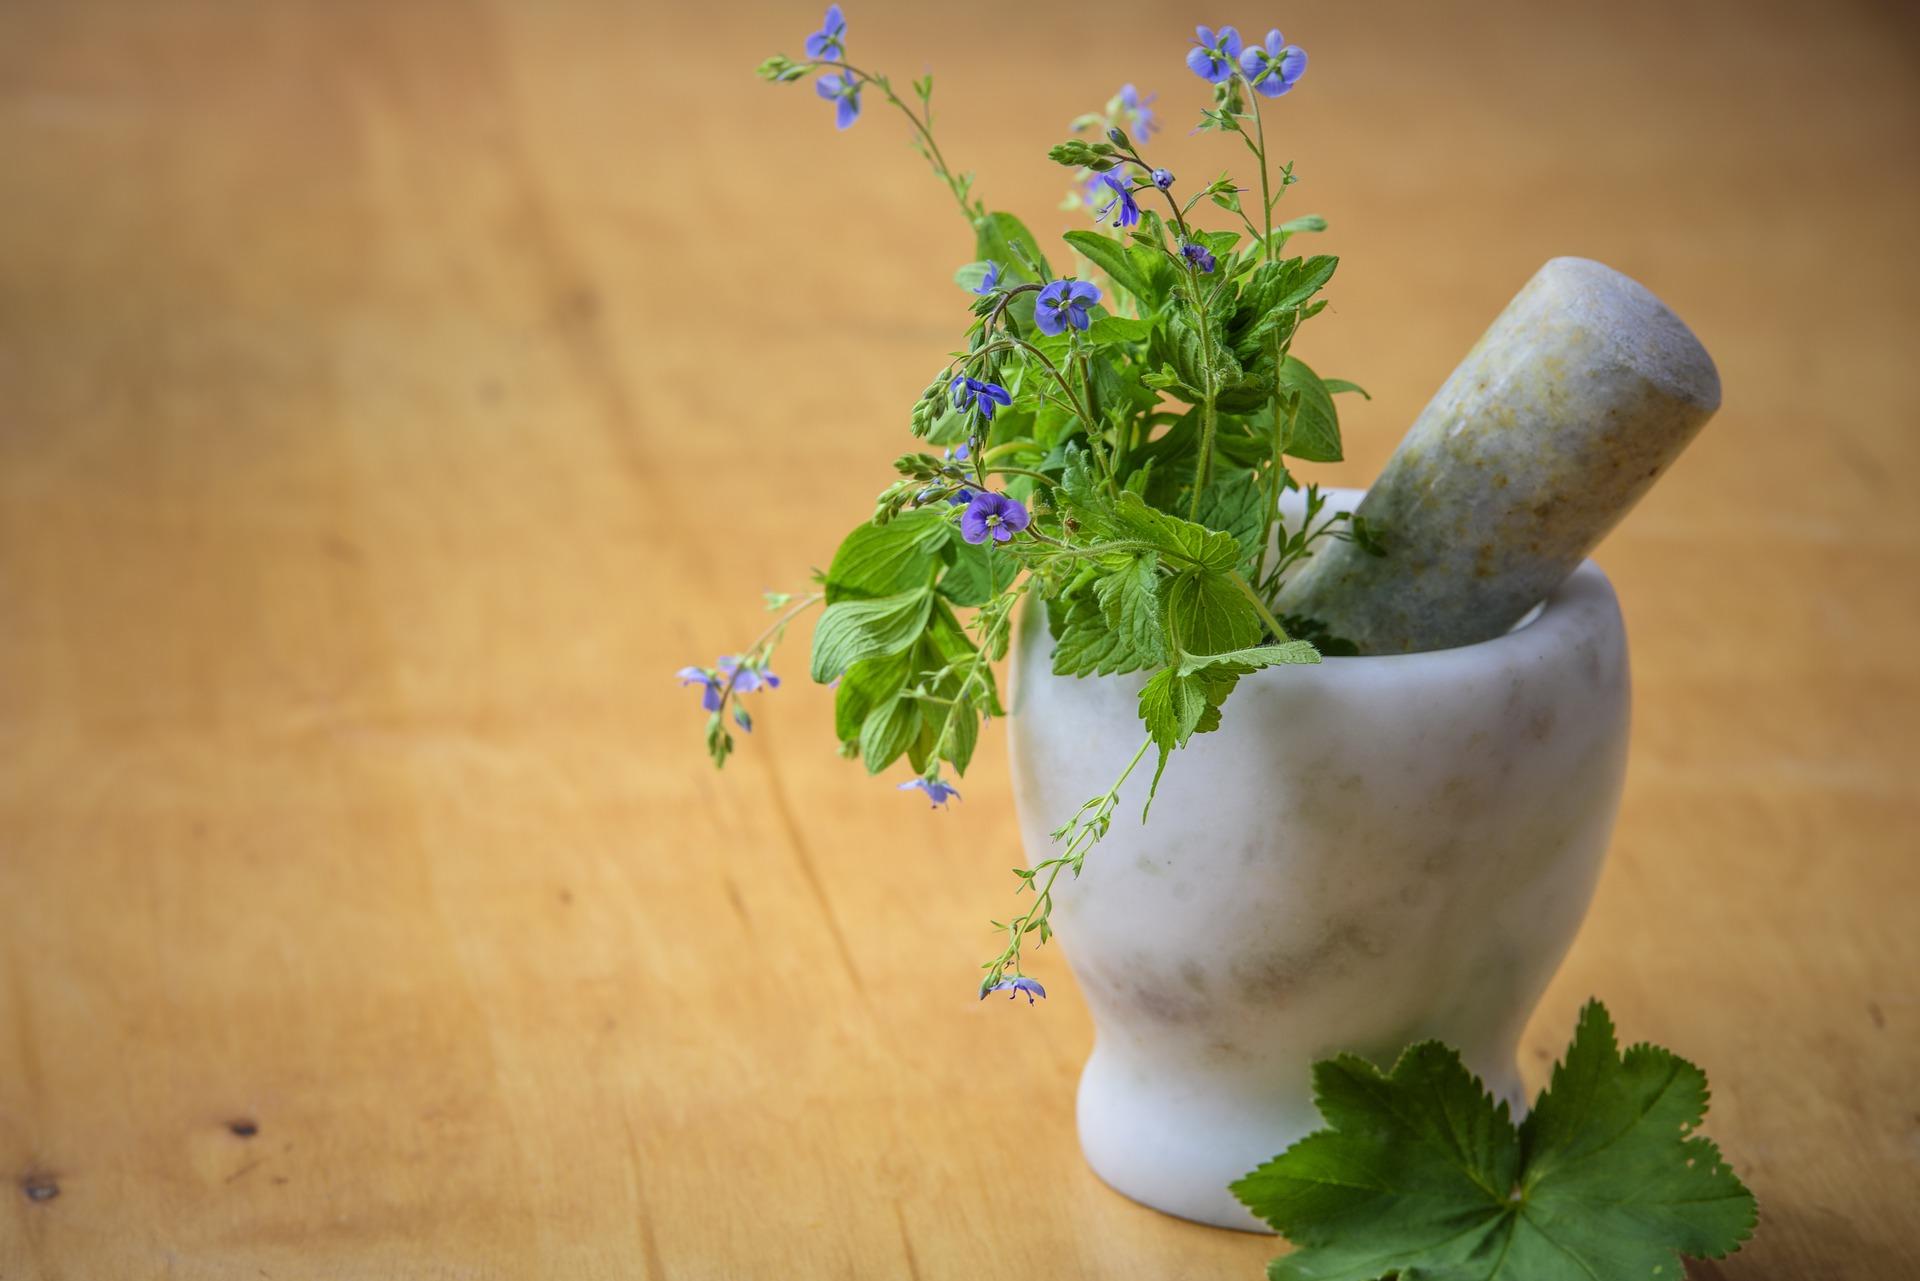 natural-medicine-1426647_1920